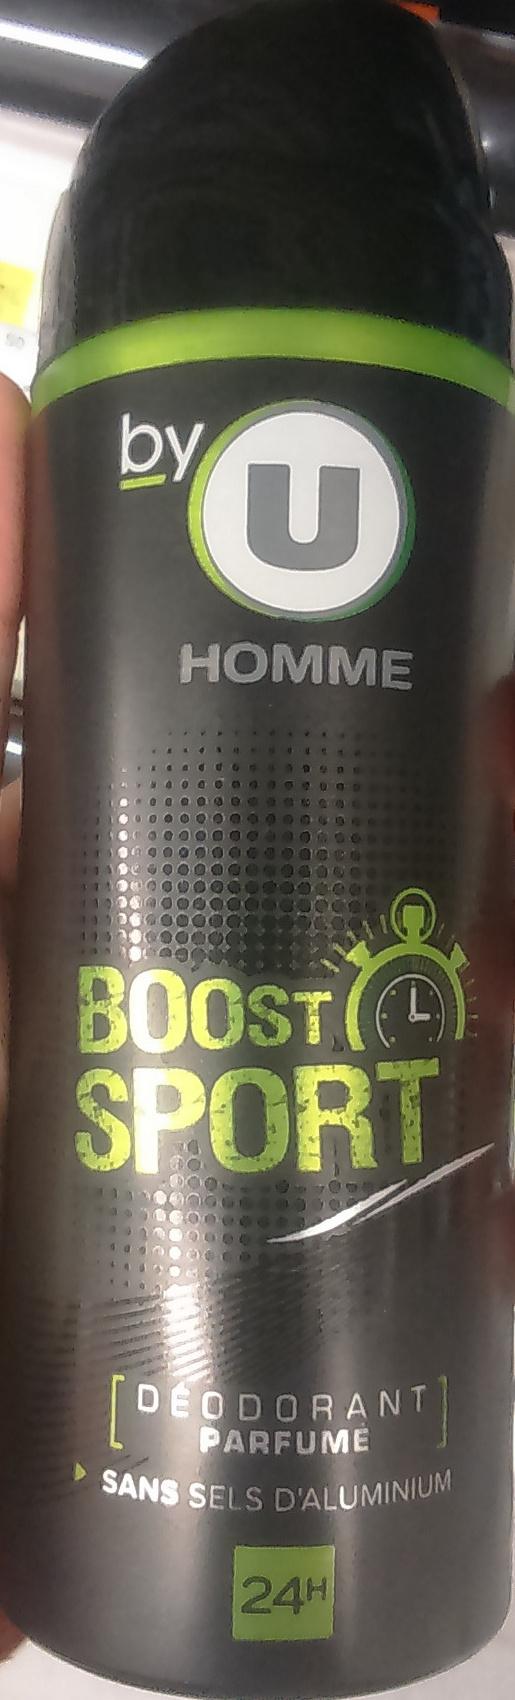 Déodorant parfumé Boost Sport - Product - fr